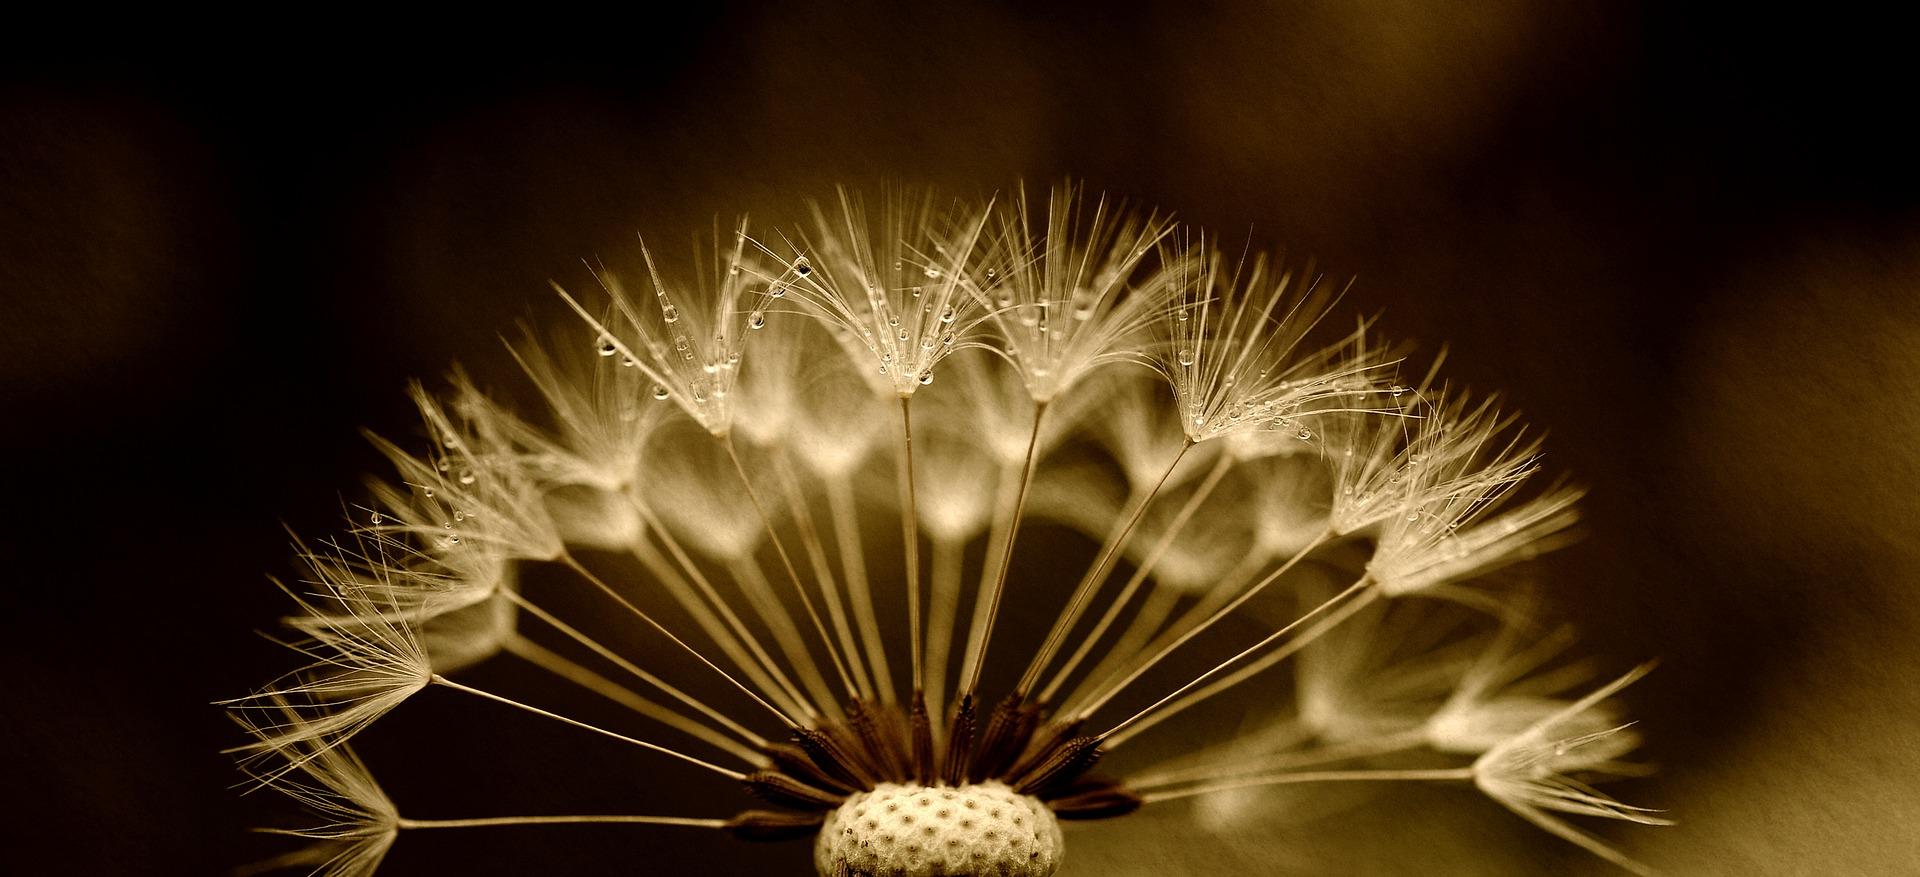 dandelion-2938939_1920.jpg